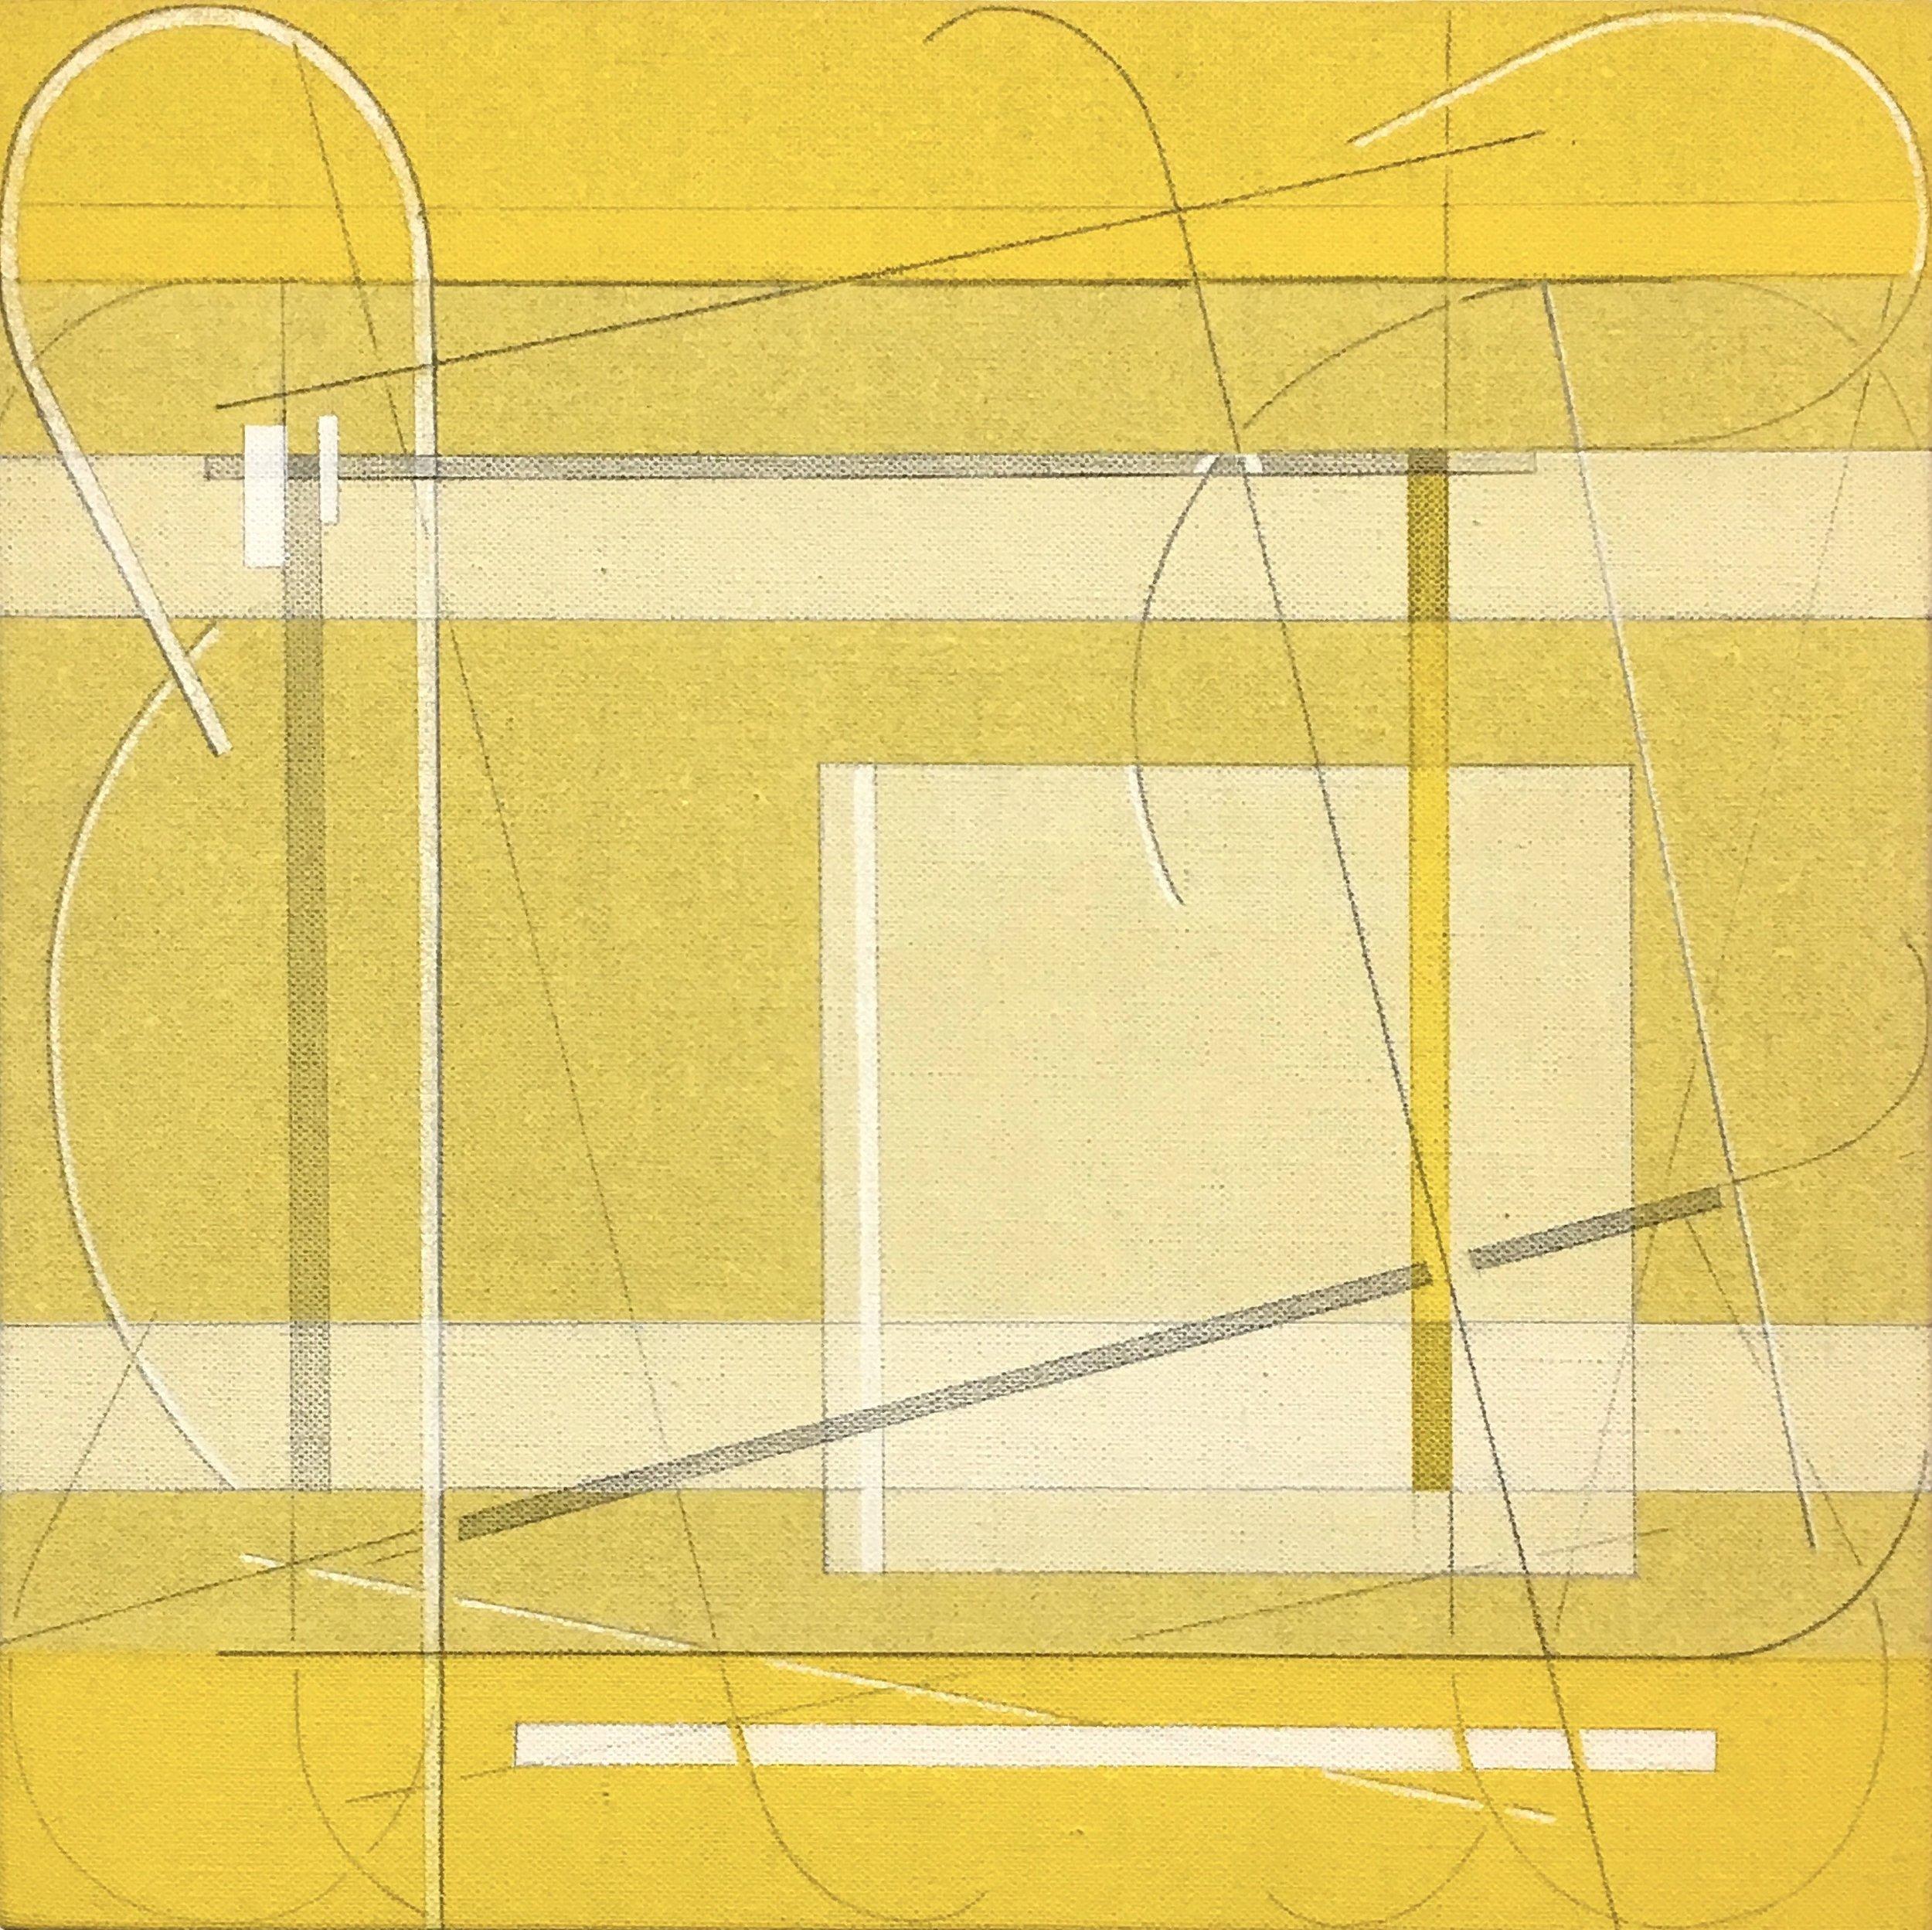 Every Other Line: Yellow Medium #2